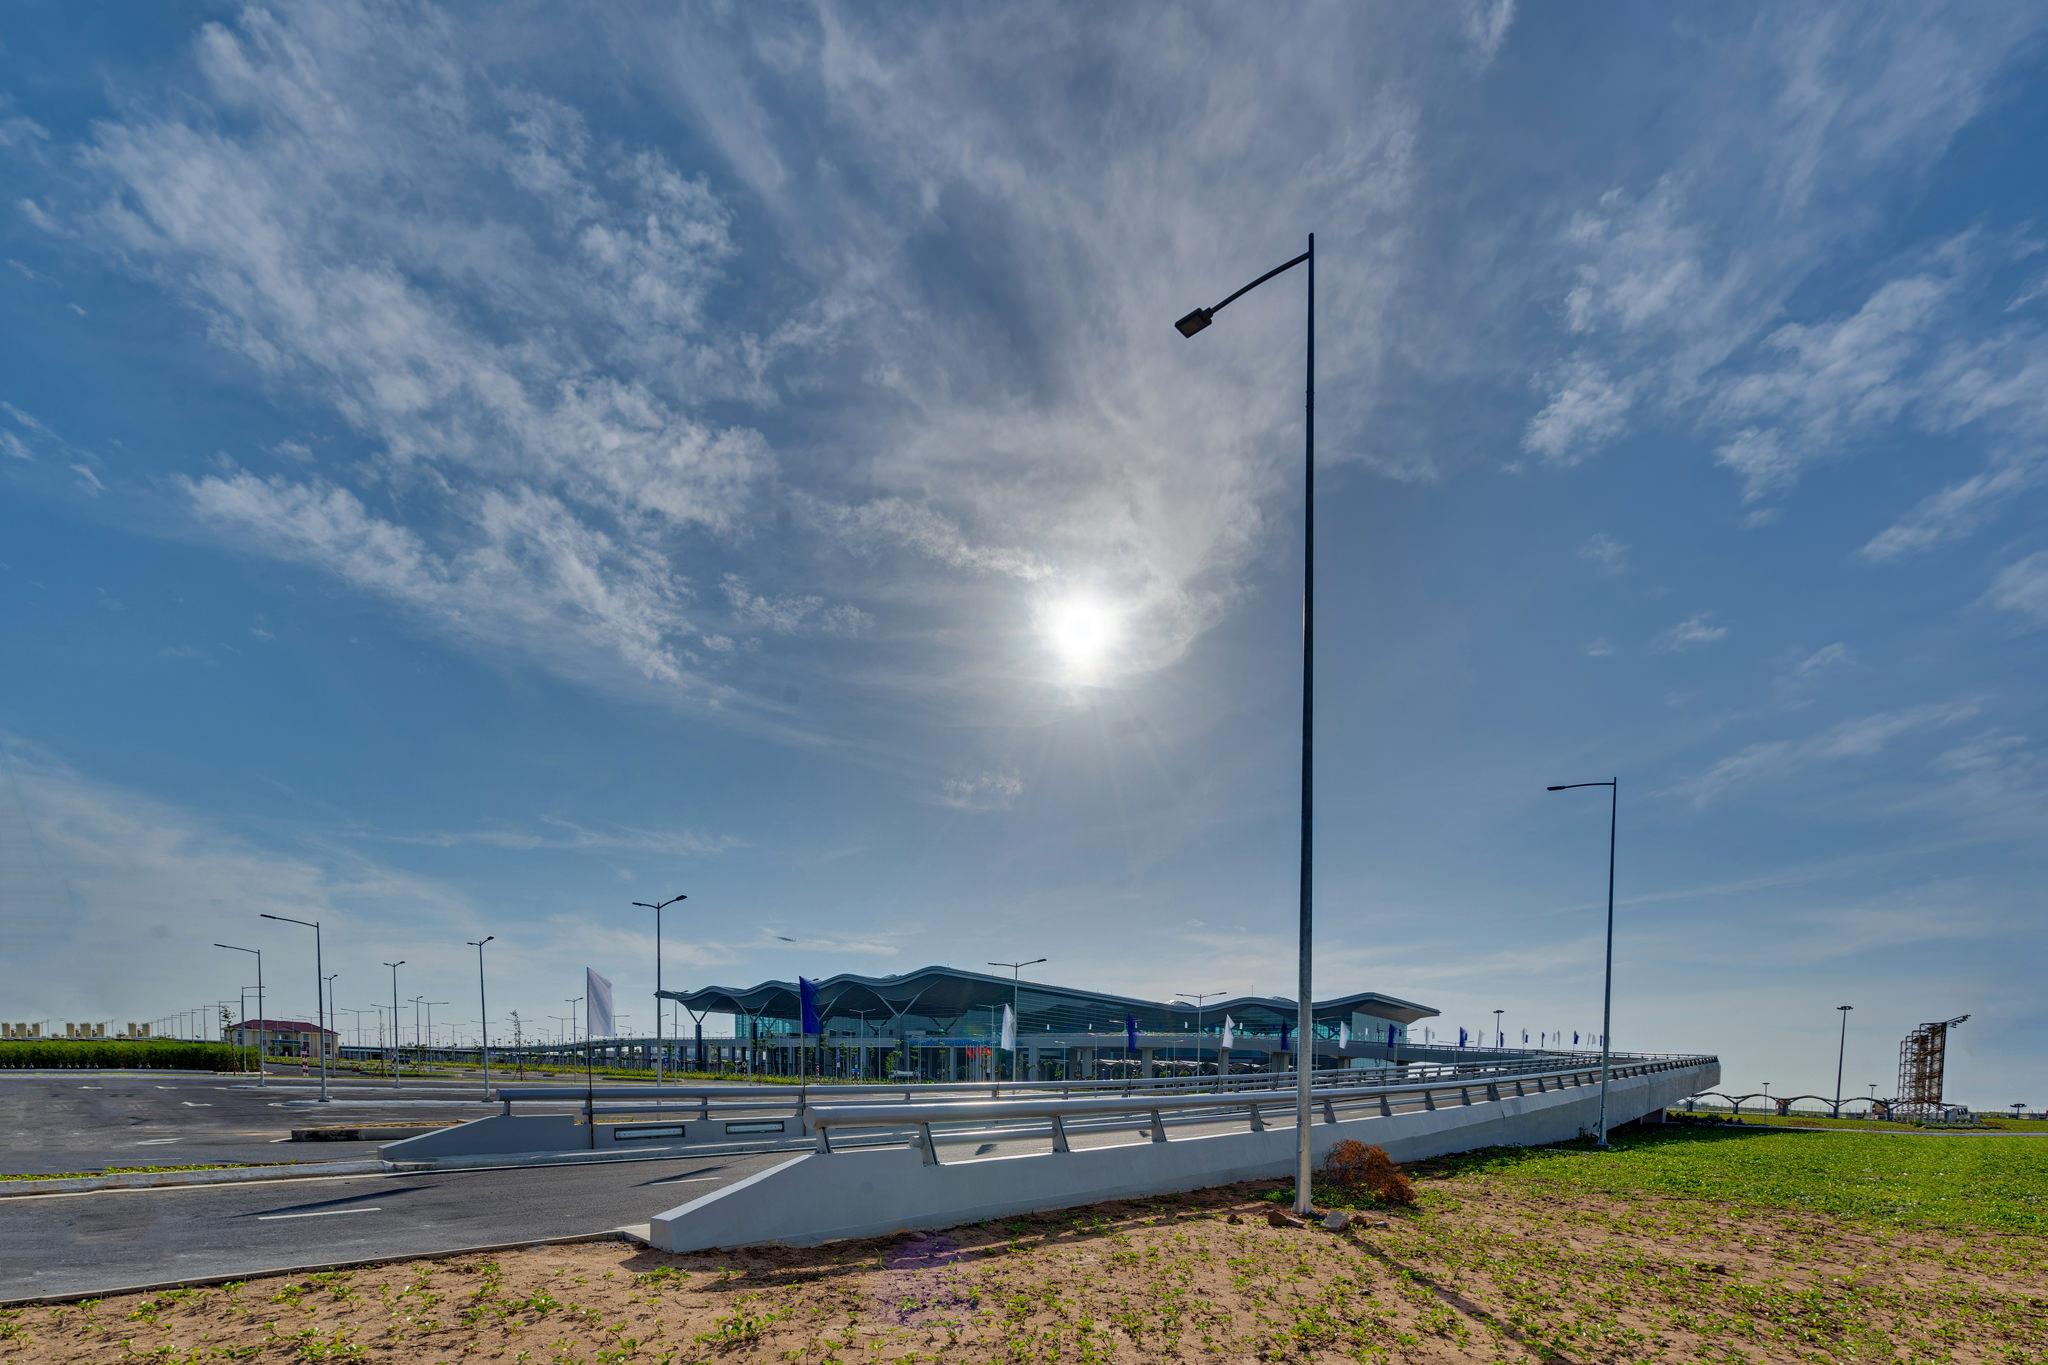 20180626 - Cam Ranh Airport - Architecture - 0249.jpg